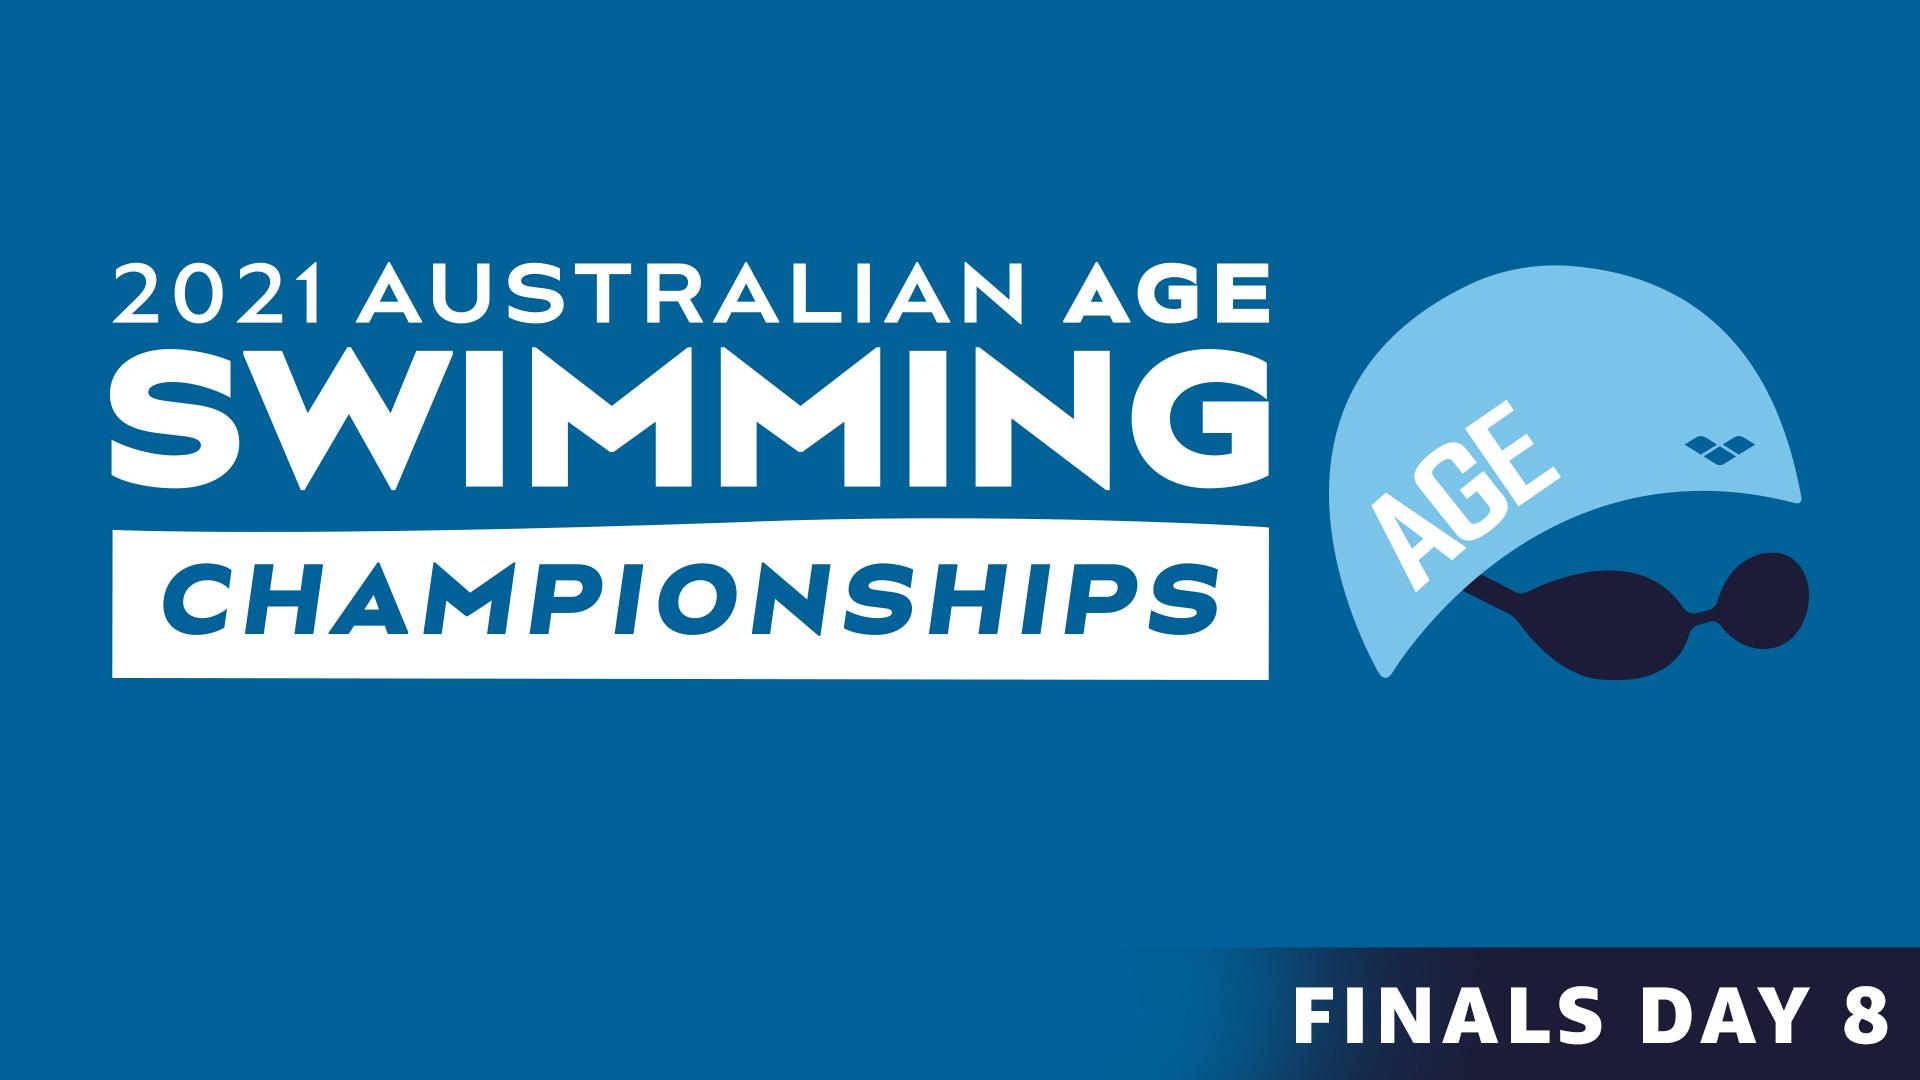 Australian Age Swimming Championships: Day 8 Finals